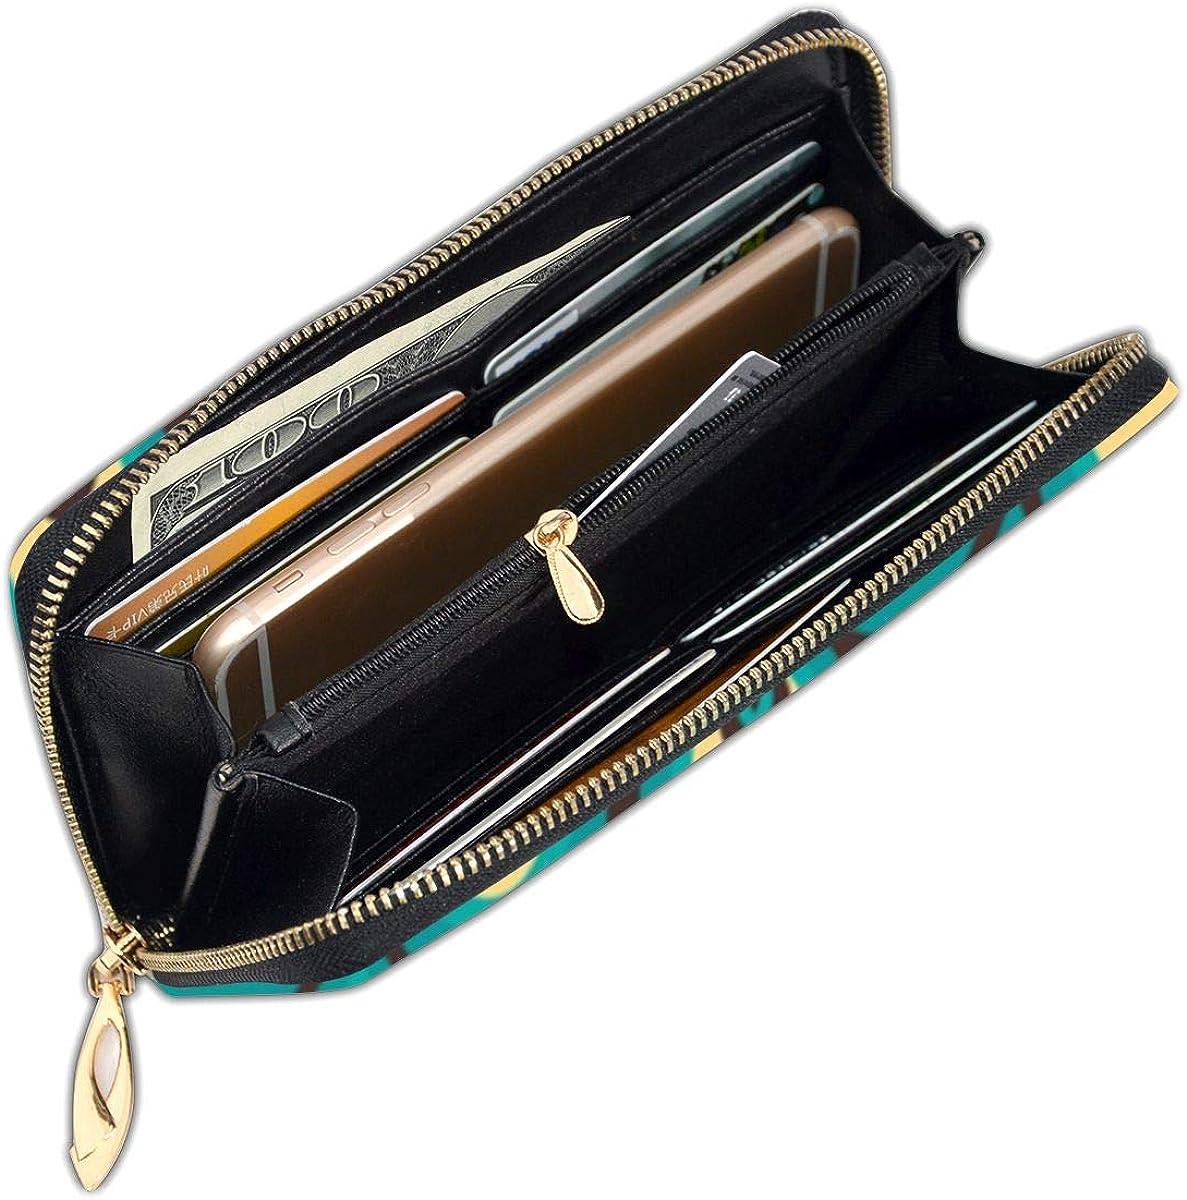 Peacock Garden Feathers Mint Wallets For Men Women Long Leather Checkbook Card Holder Purse Zipper Buckle Elegant Clutch Ladies Coin Purse